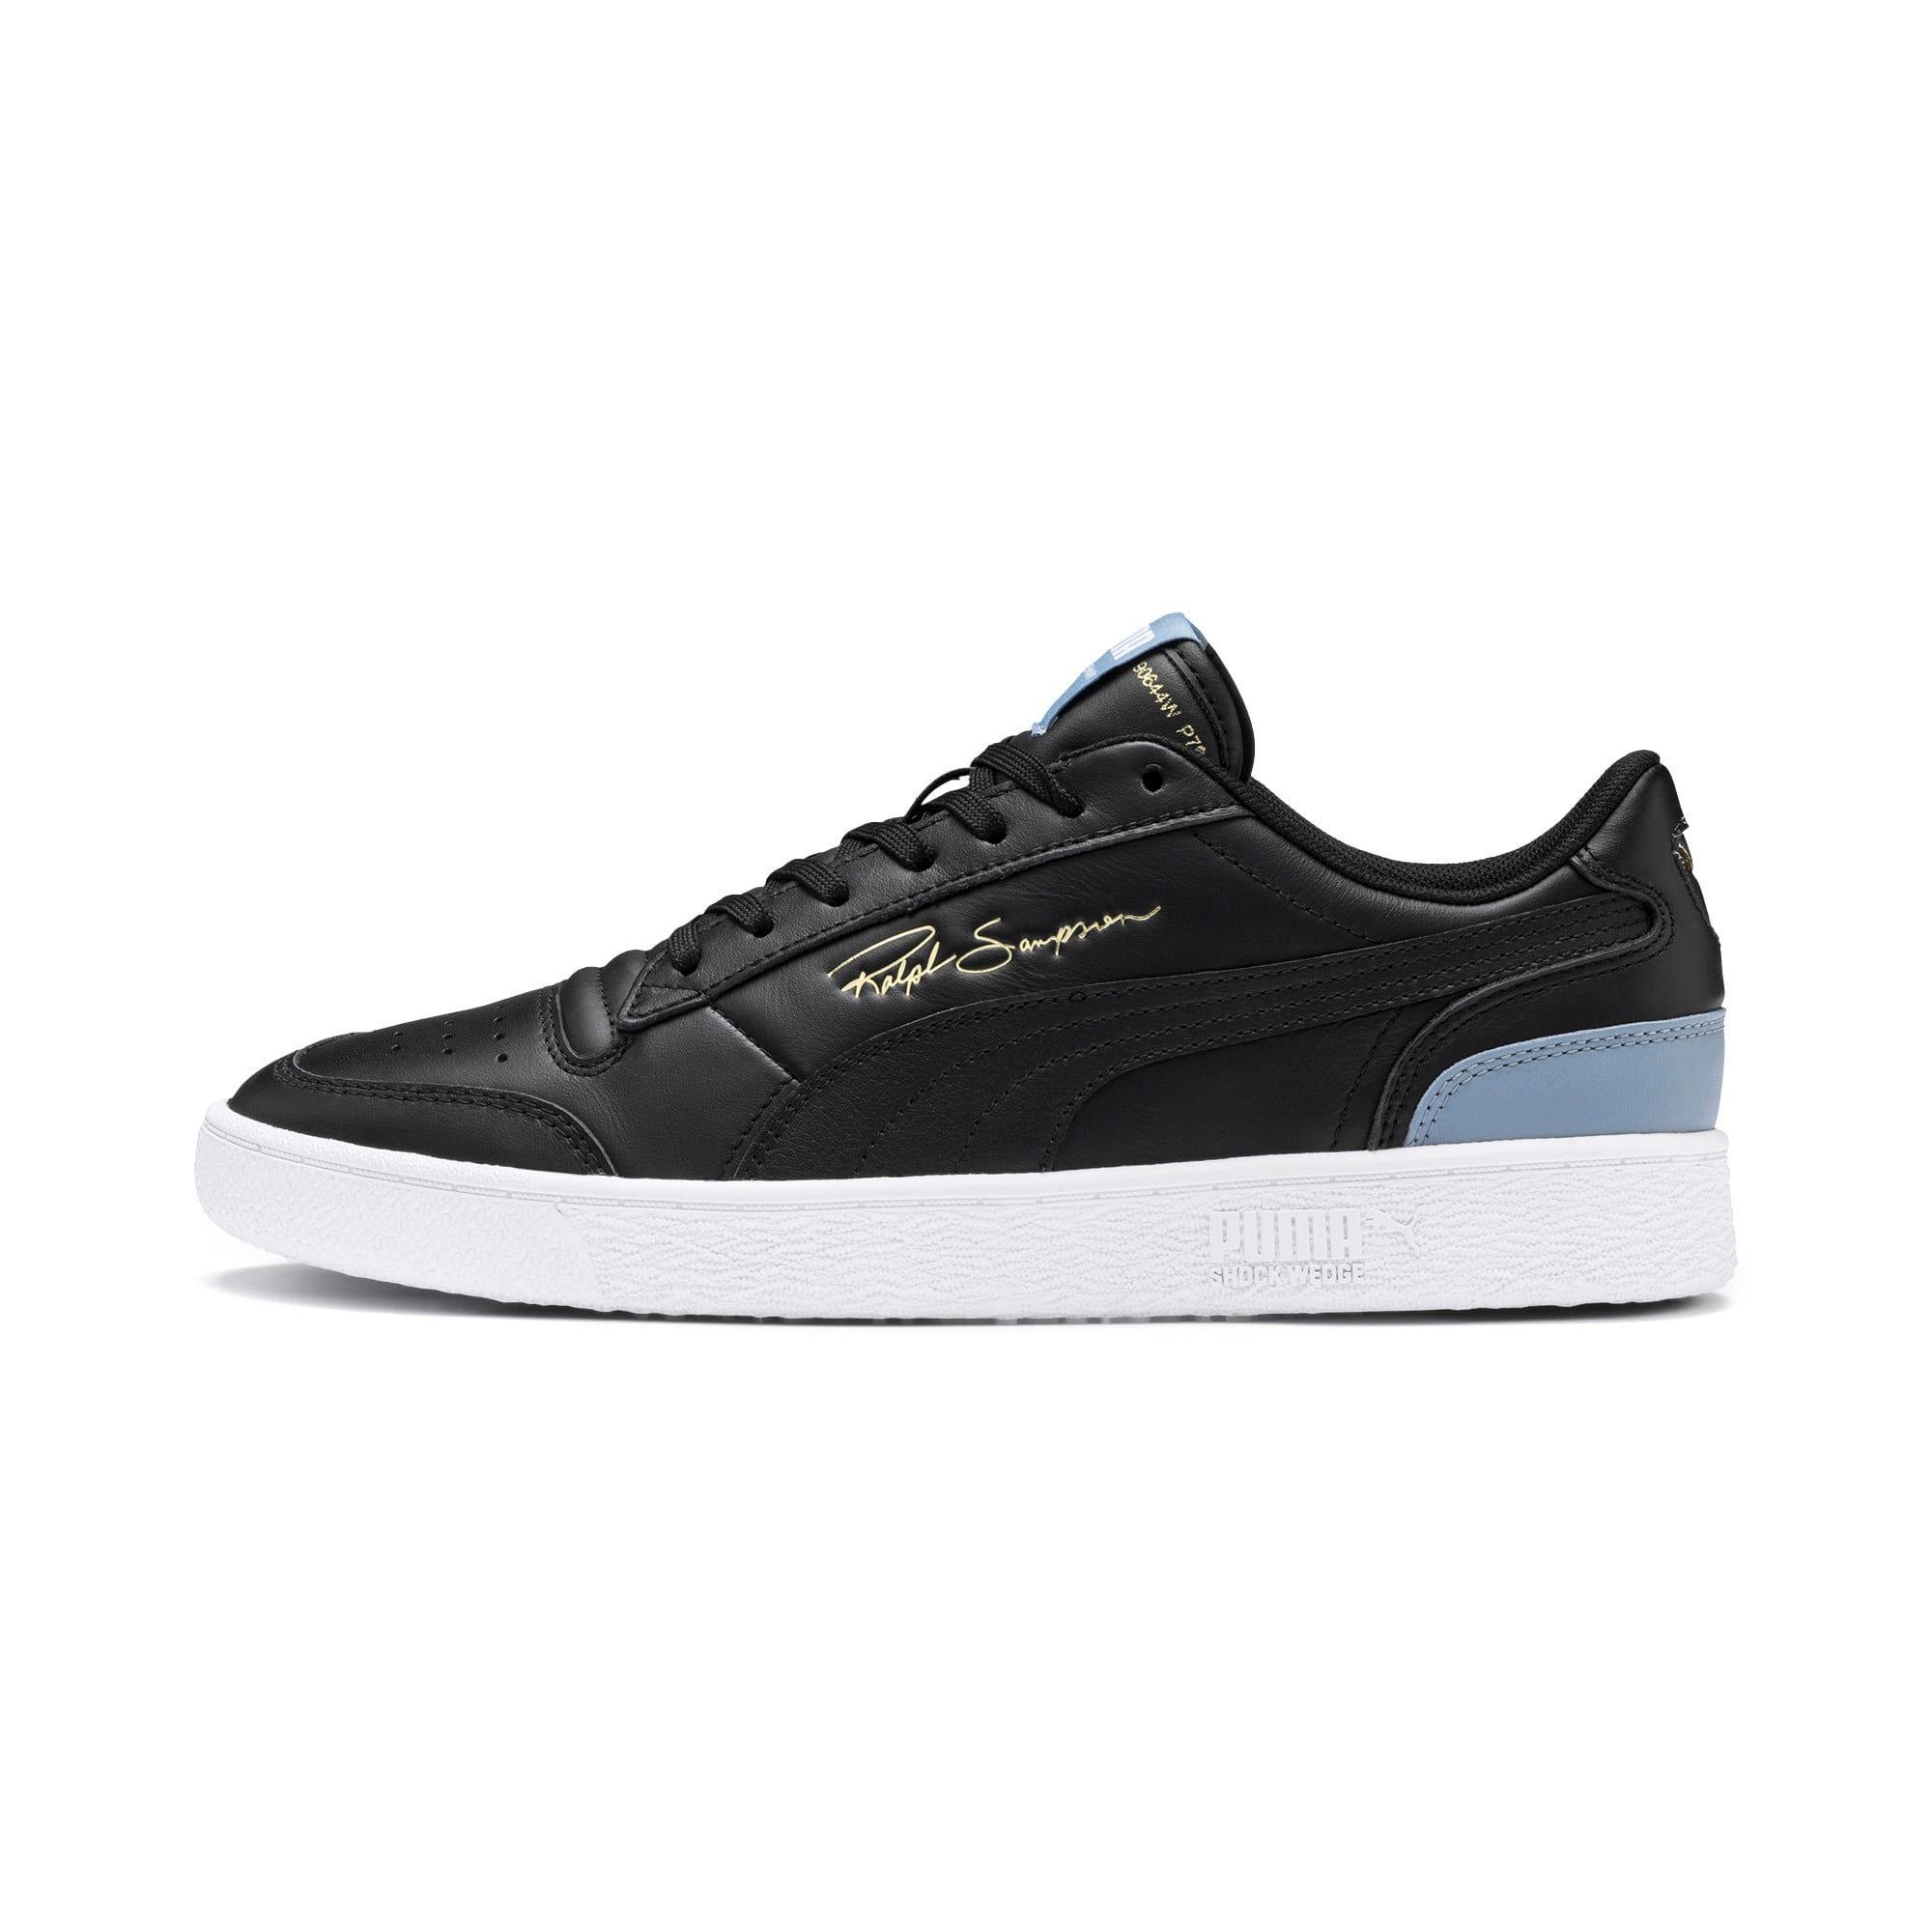 Miniatura 1 de Zapatos deportivosRalph Sampson Lo, Puma Blk-Puma Blk-FadedDenim, mediano